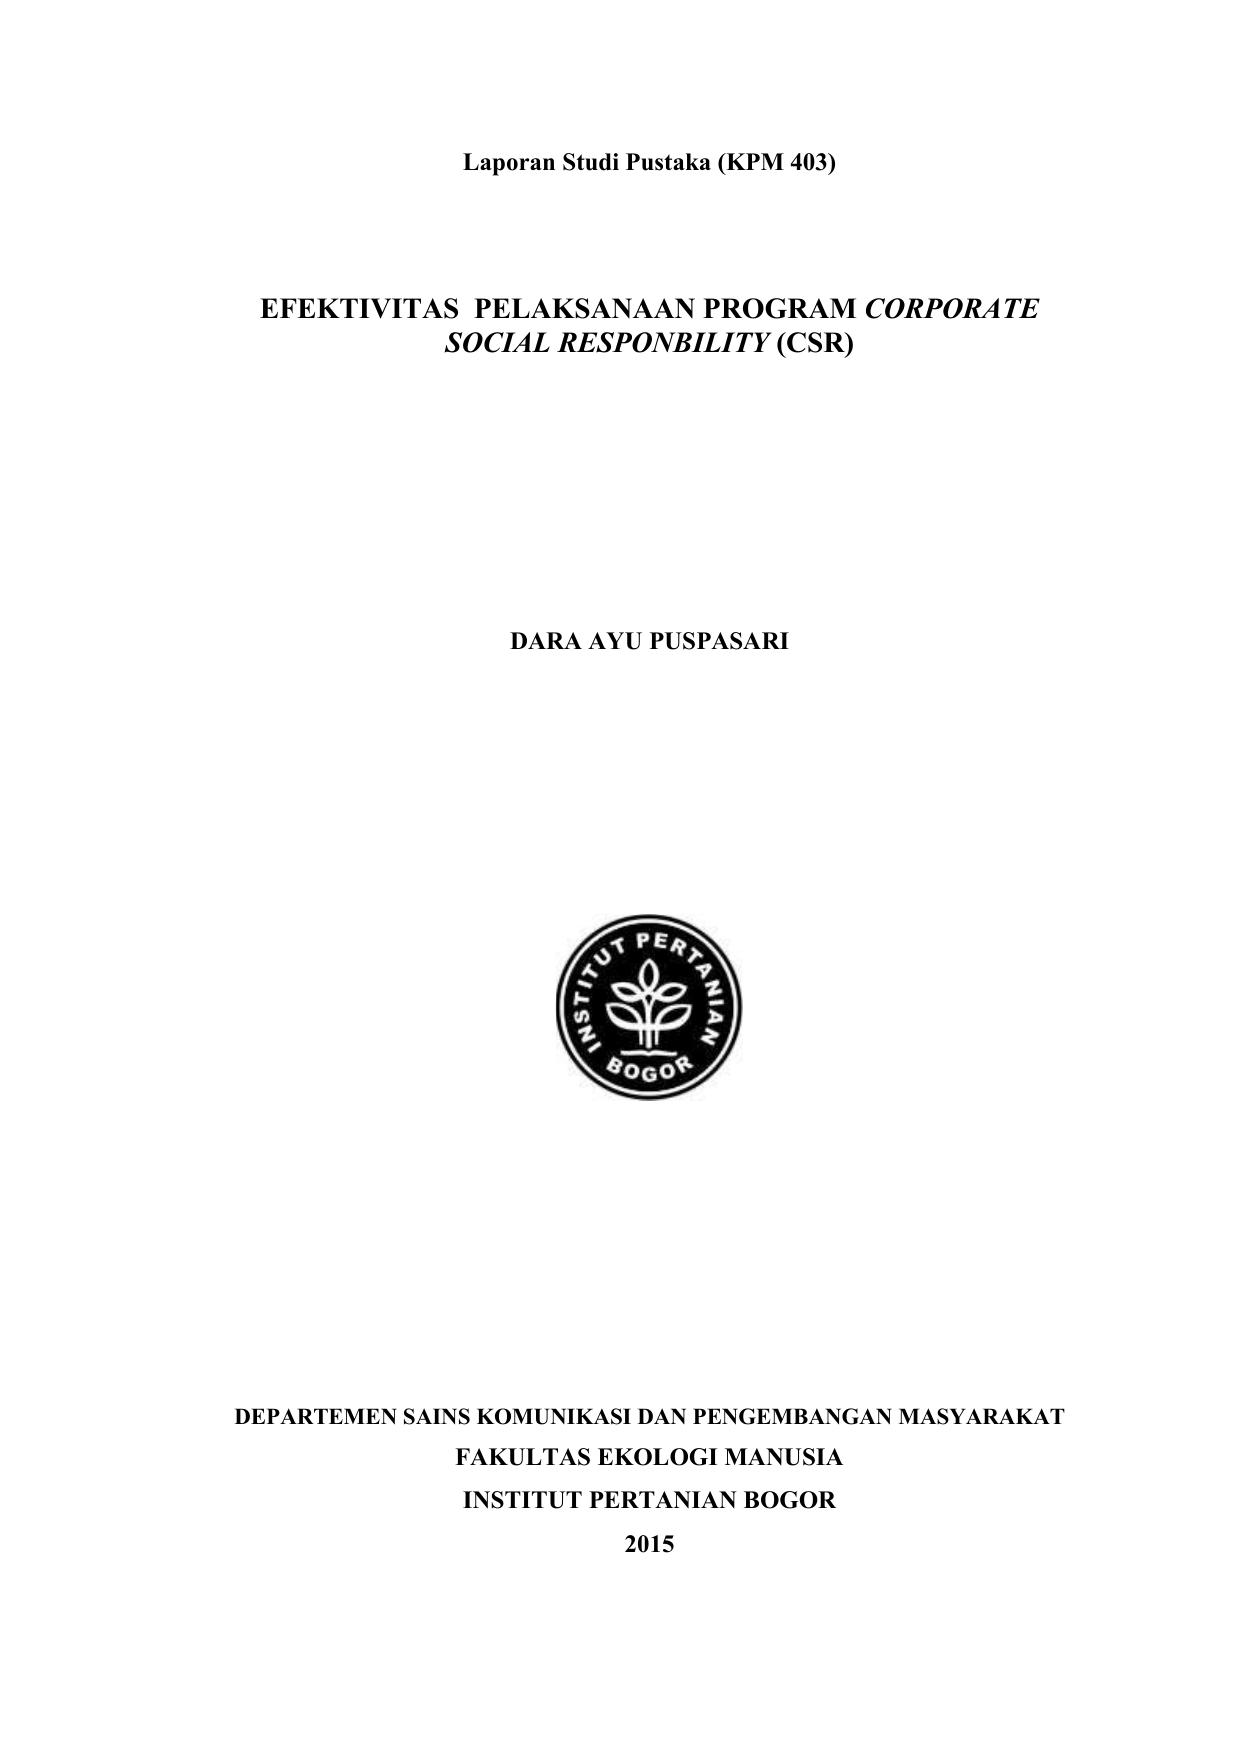 Evaluasi Program Corporate Social Responsibility Dalam Meningkatkan Citra Positif Pt Pln Persero Studi Interpretif Kualitatif Pada Sub Bidang Komunikasi Pln Unit Induk Pembangunan Jawa Bagian Tengah I Tahun 2018 Eprints Upn Veteran